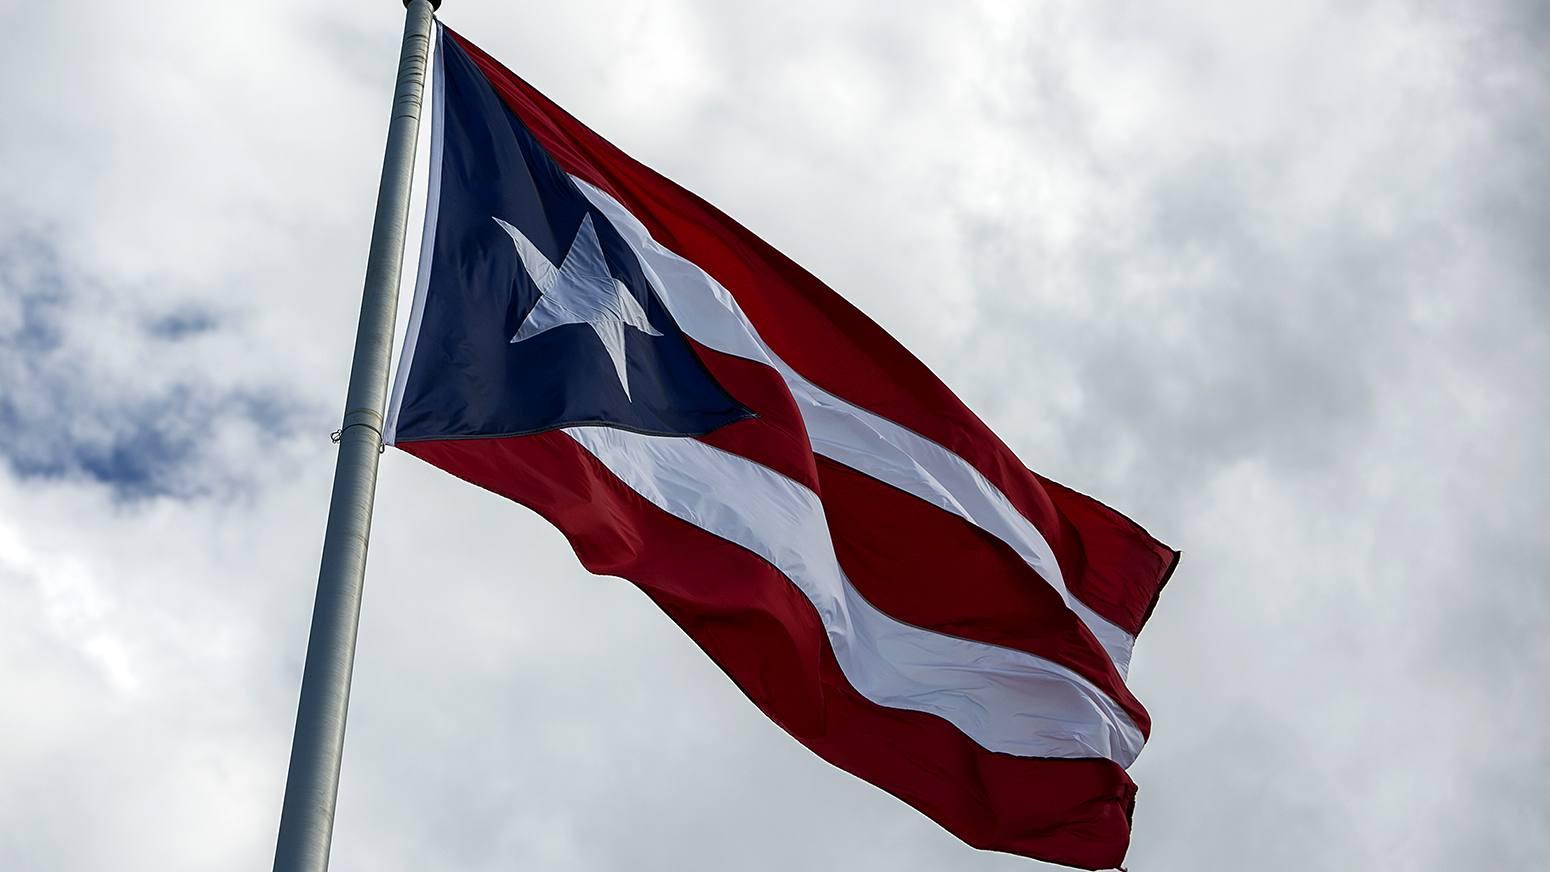 U.S. First Circuit Court of Appeals Invalidates PROMESA Board